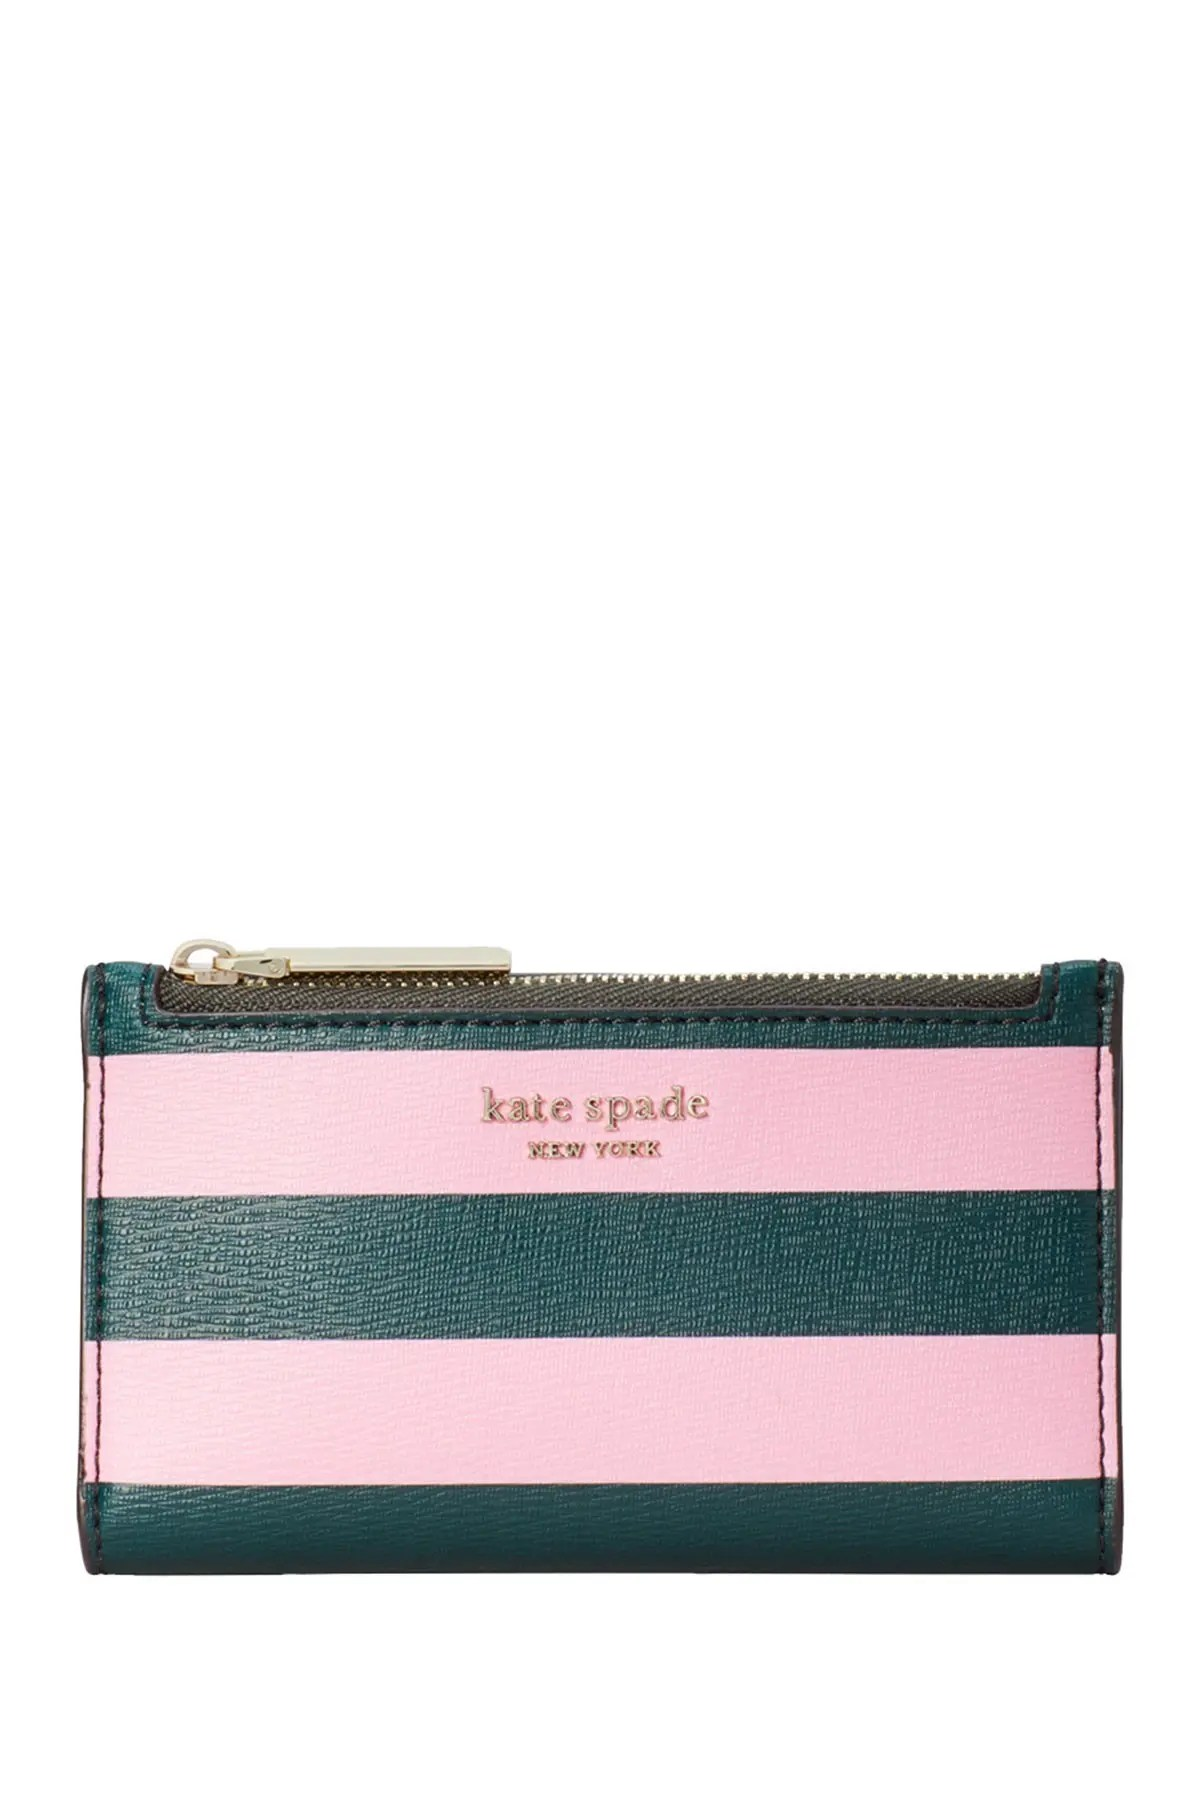 kate spade new york sylvia small striped slim bifold wallet nordstrom rack